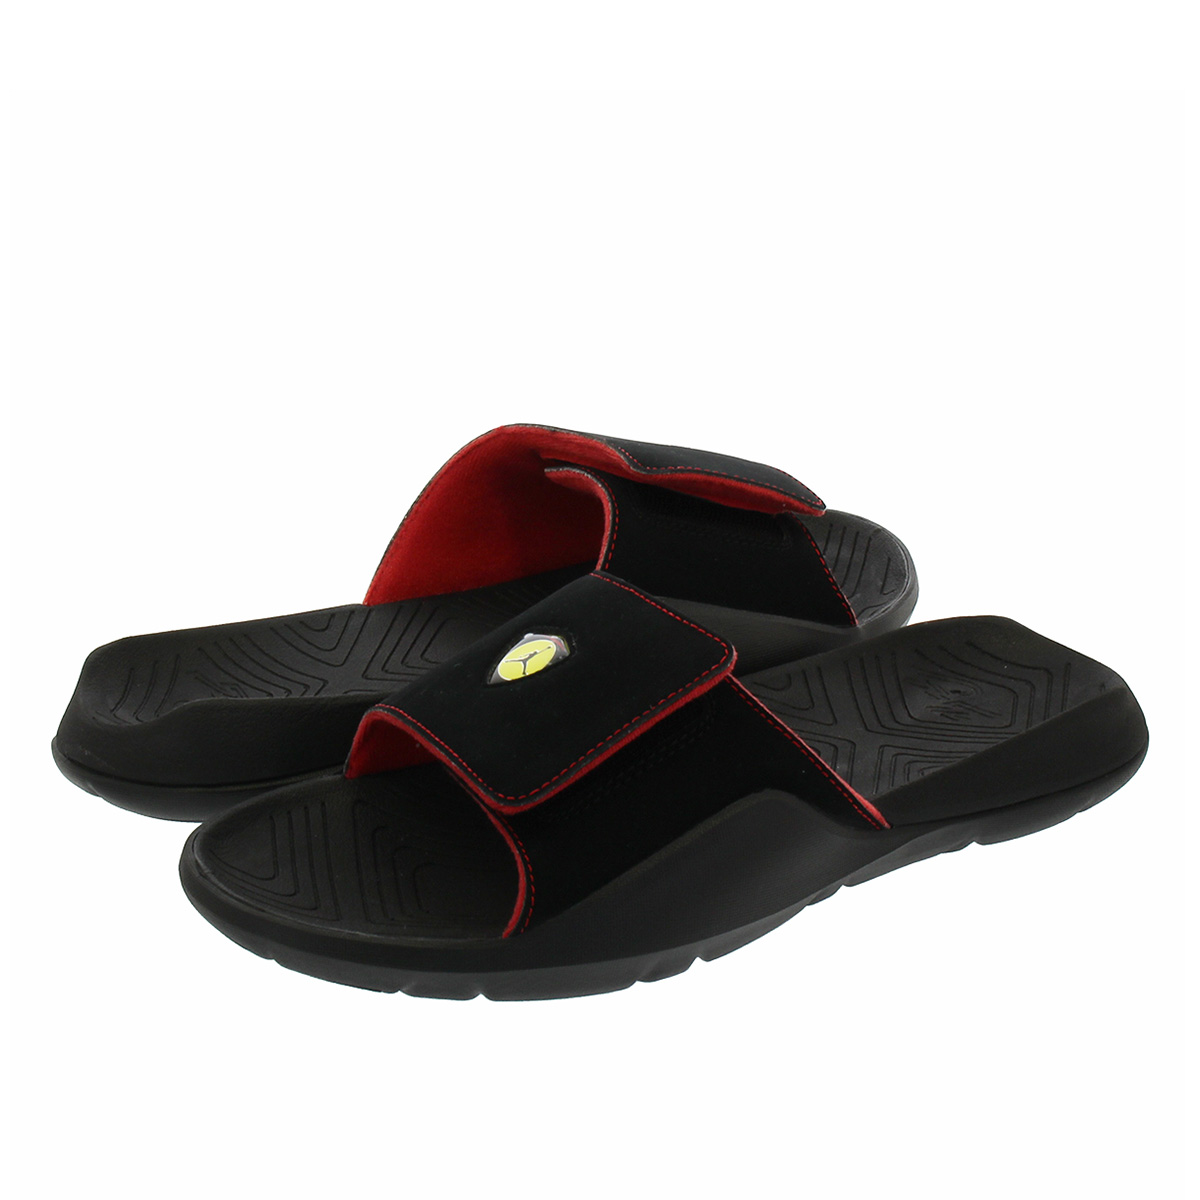 bac4eeb5c5d2ba LOWTEX BIG-SMALL SHOP  NIKE JORDAN HYDRO 7 Nike Jordan high mud 7  BLACK BLACK